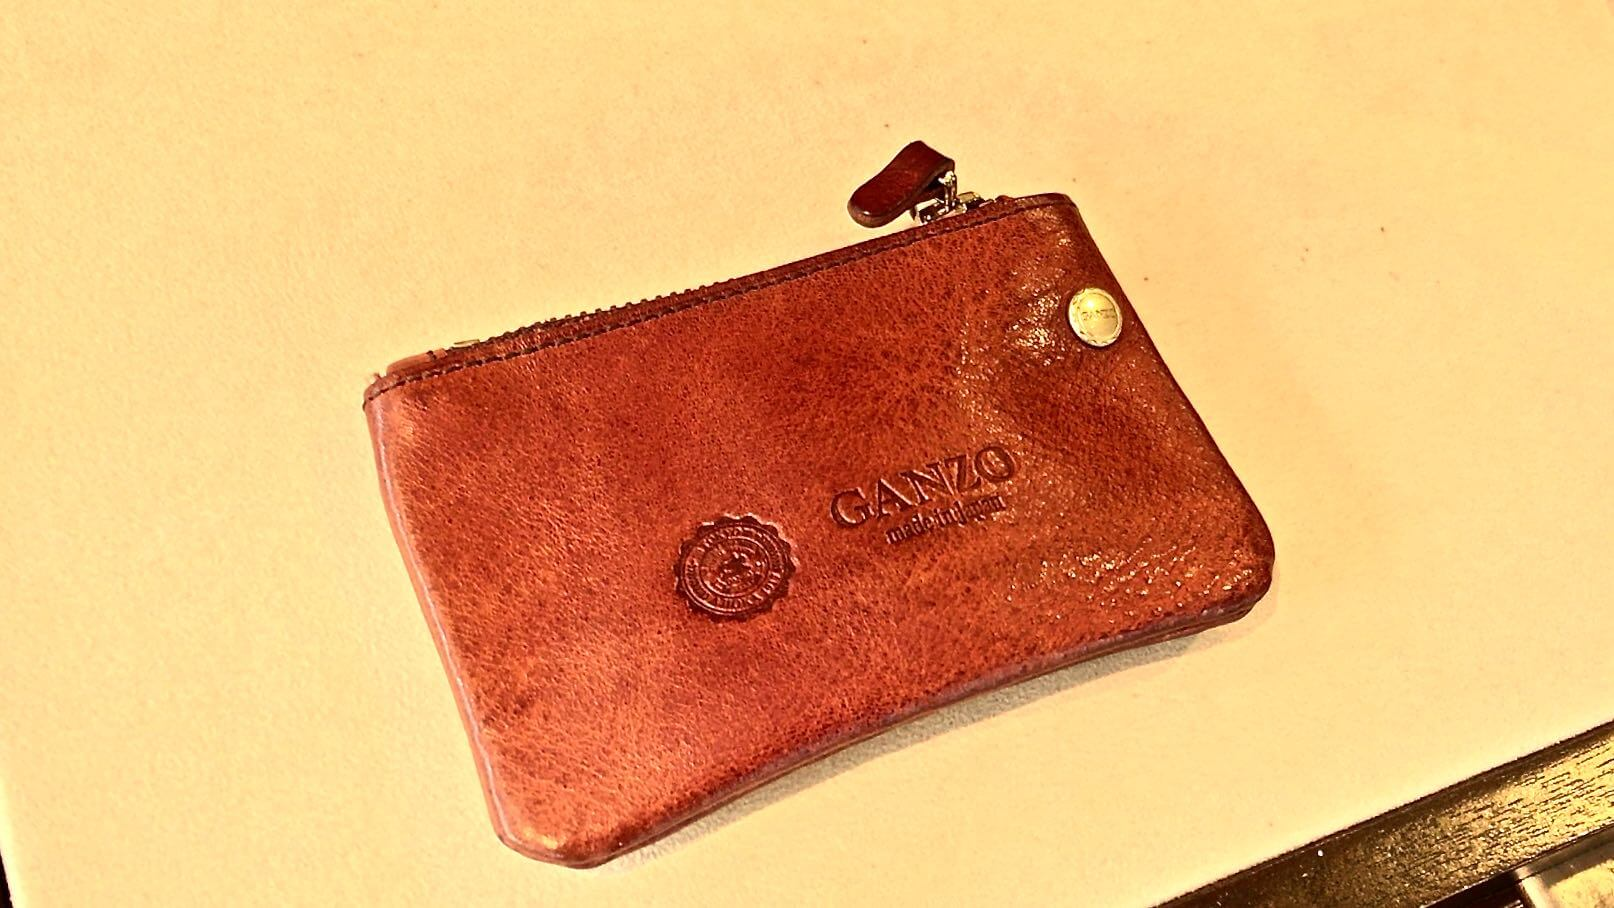 12 Ganzo SACCHETTO2 Wallet pouch